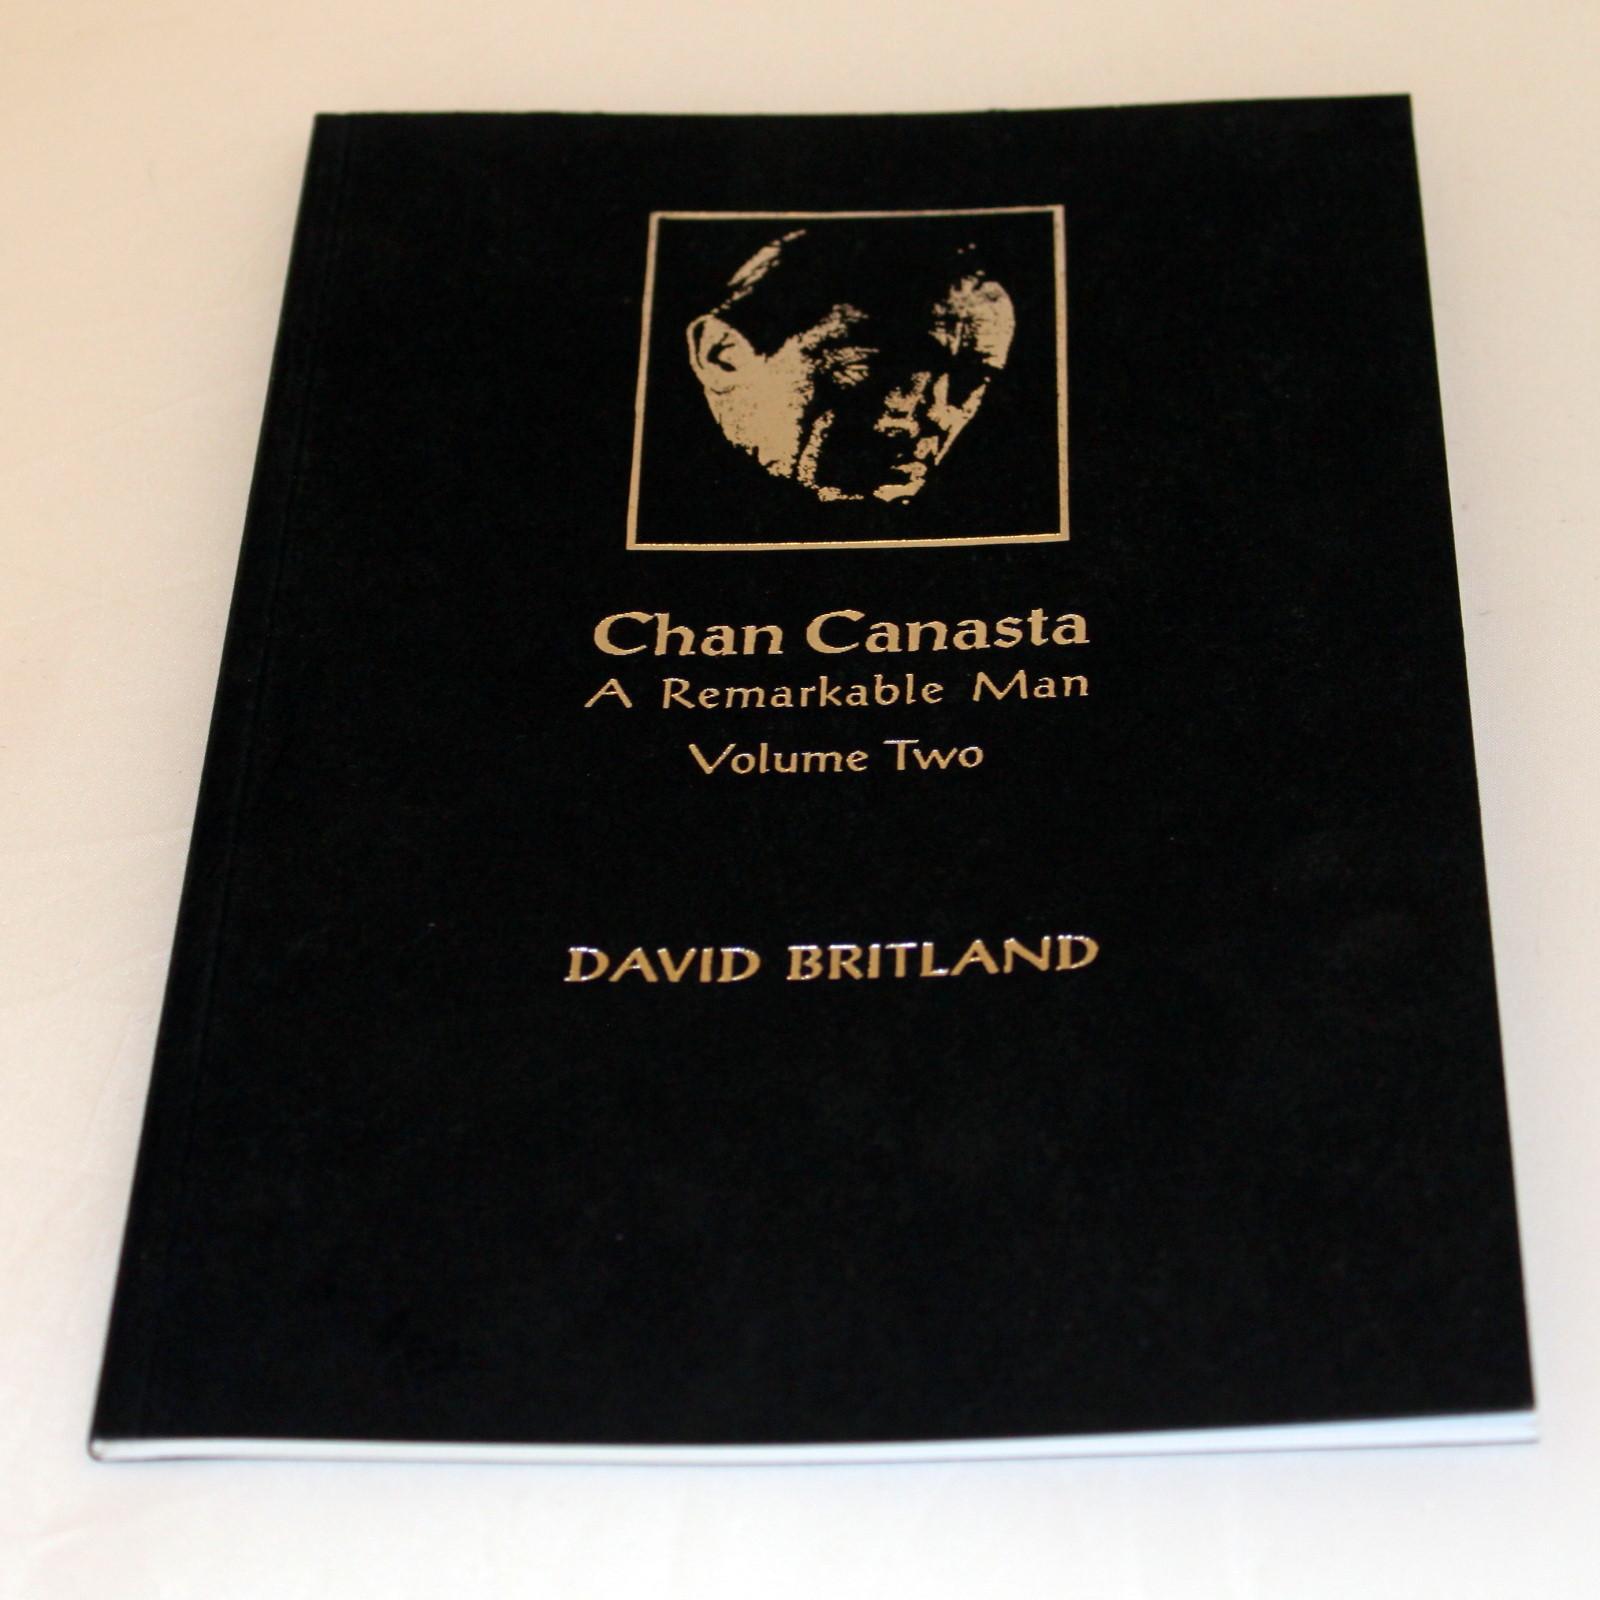 Chan Canasta - A Remarkable Man Vol. 2 by David Britland